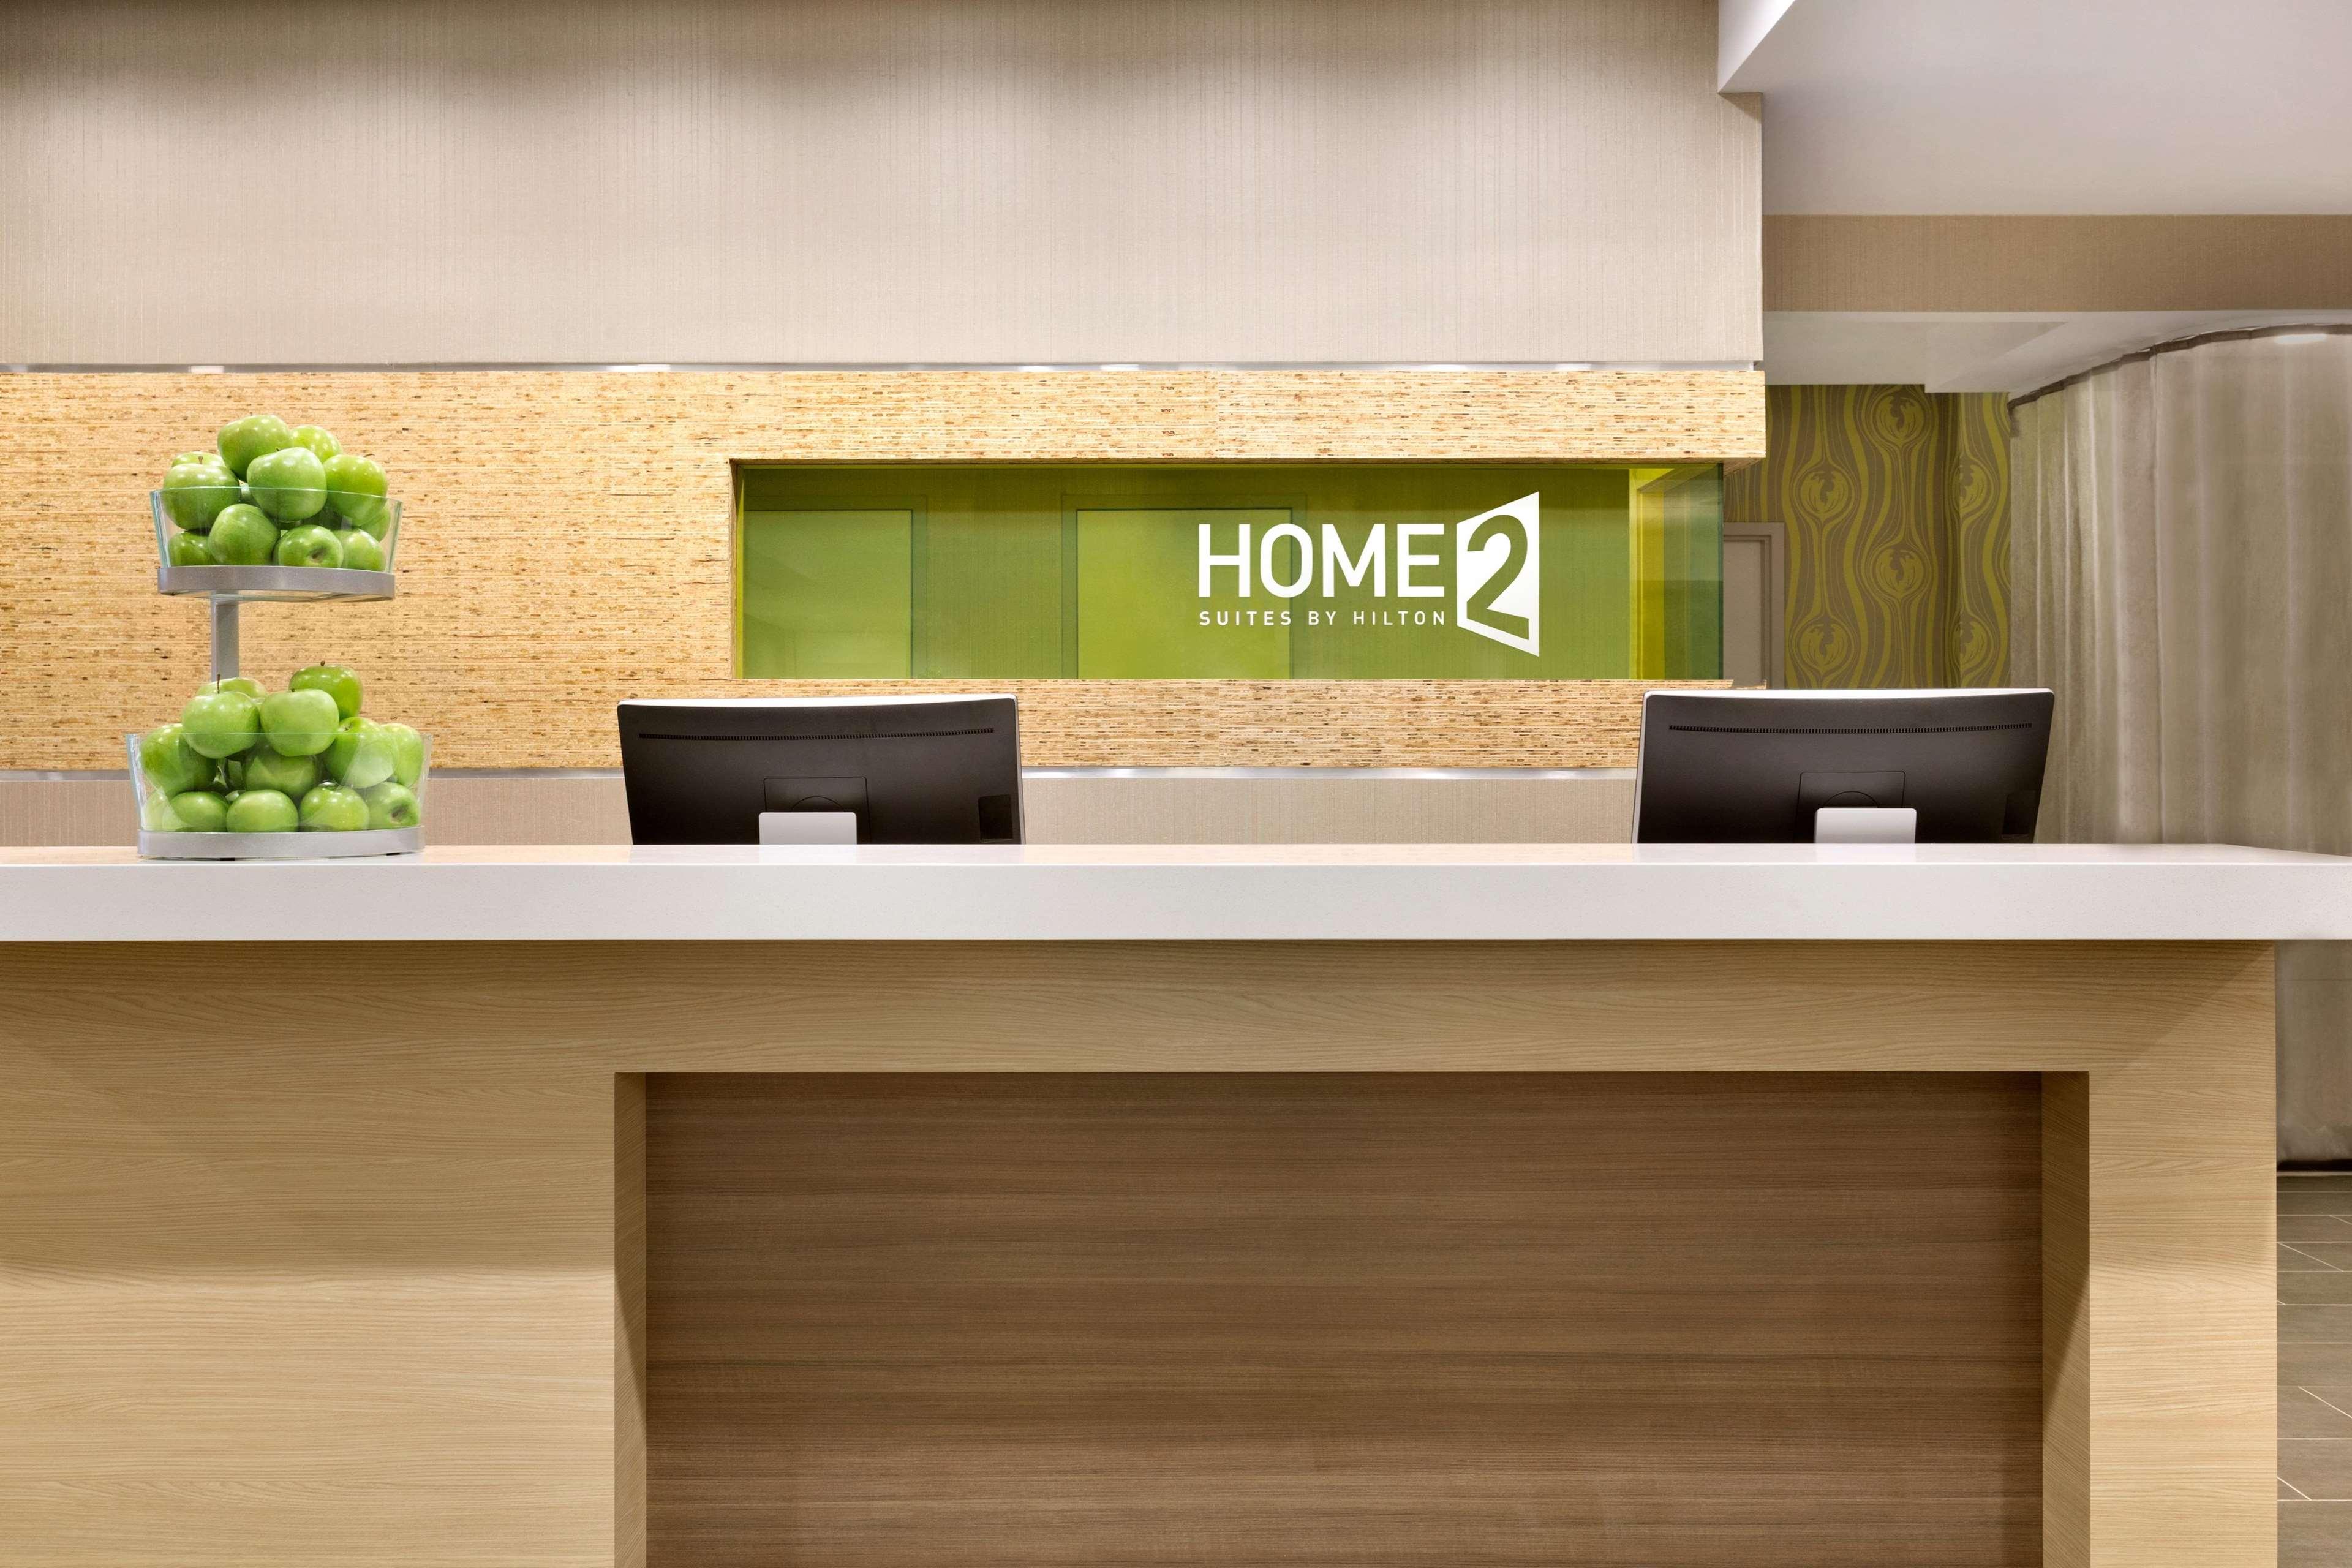 Home2 Suites by Hilton Florence Cincinnati Airport South image 4